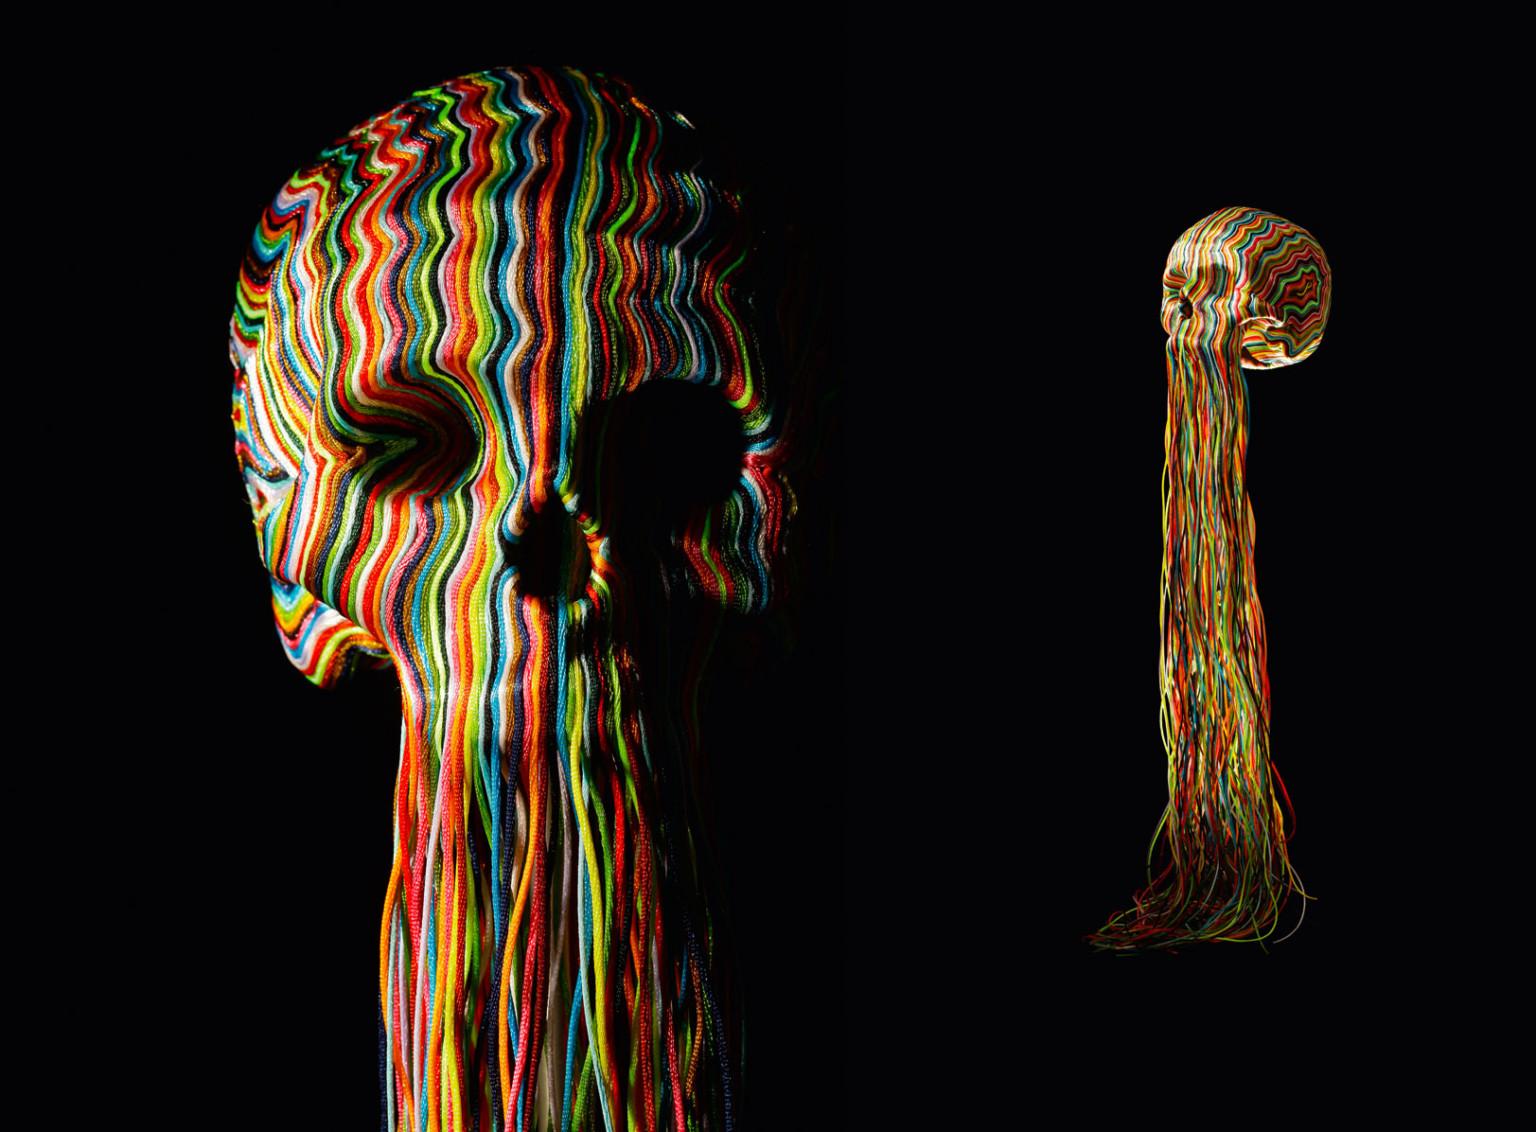 skull-3-768x566_2x.jpg